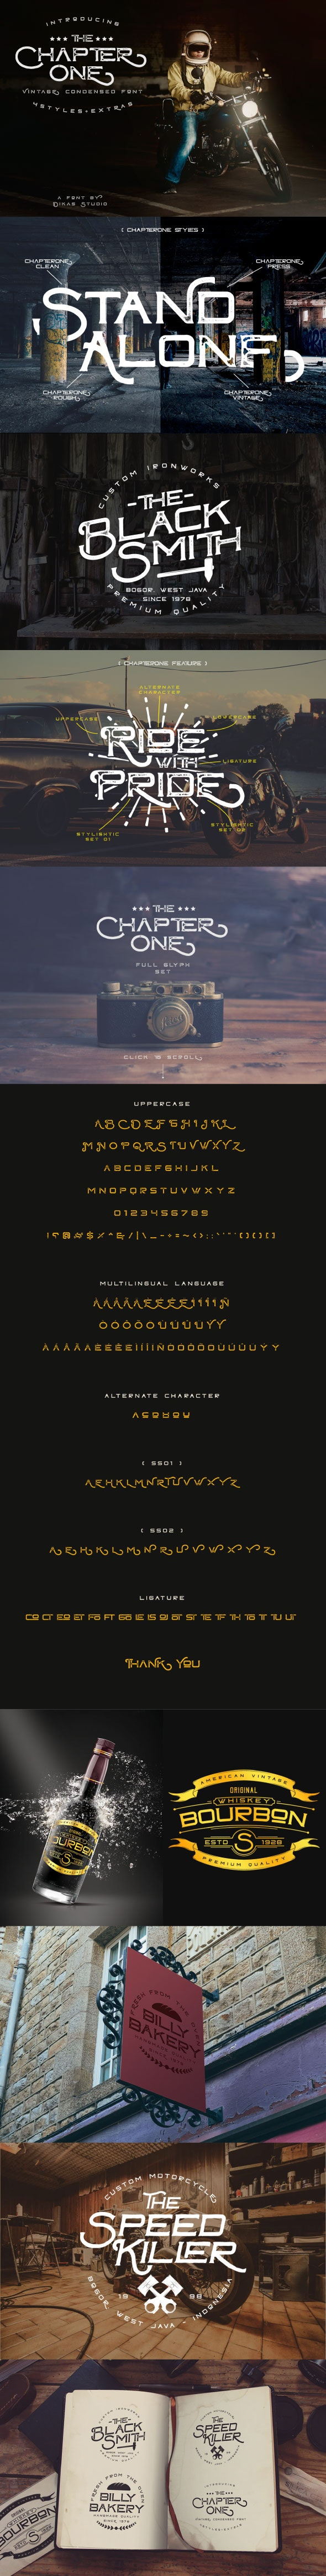 ChapterOne - 4 Styles - Grunge Decorative